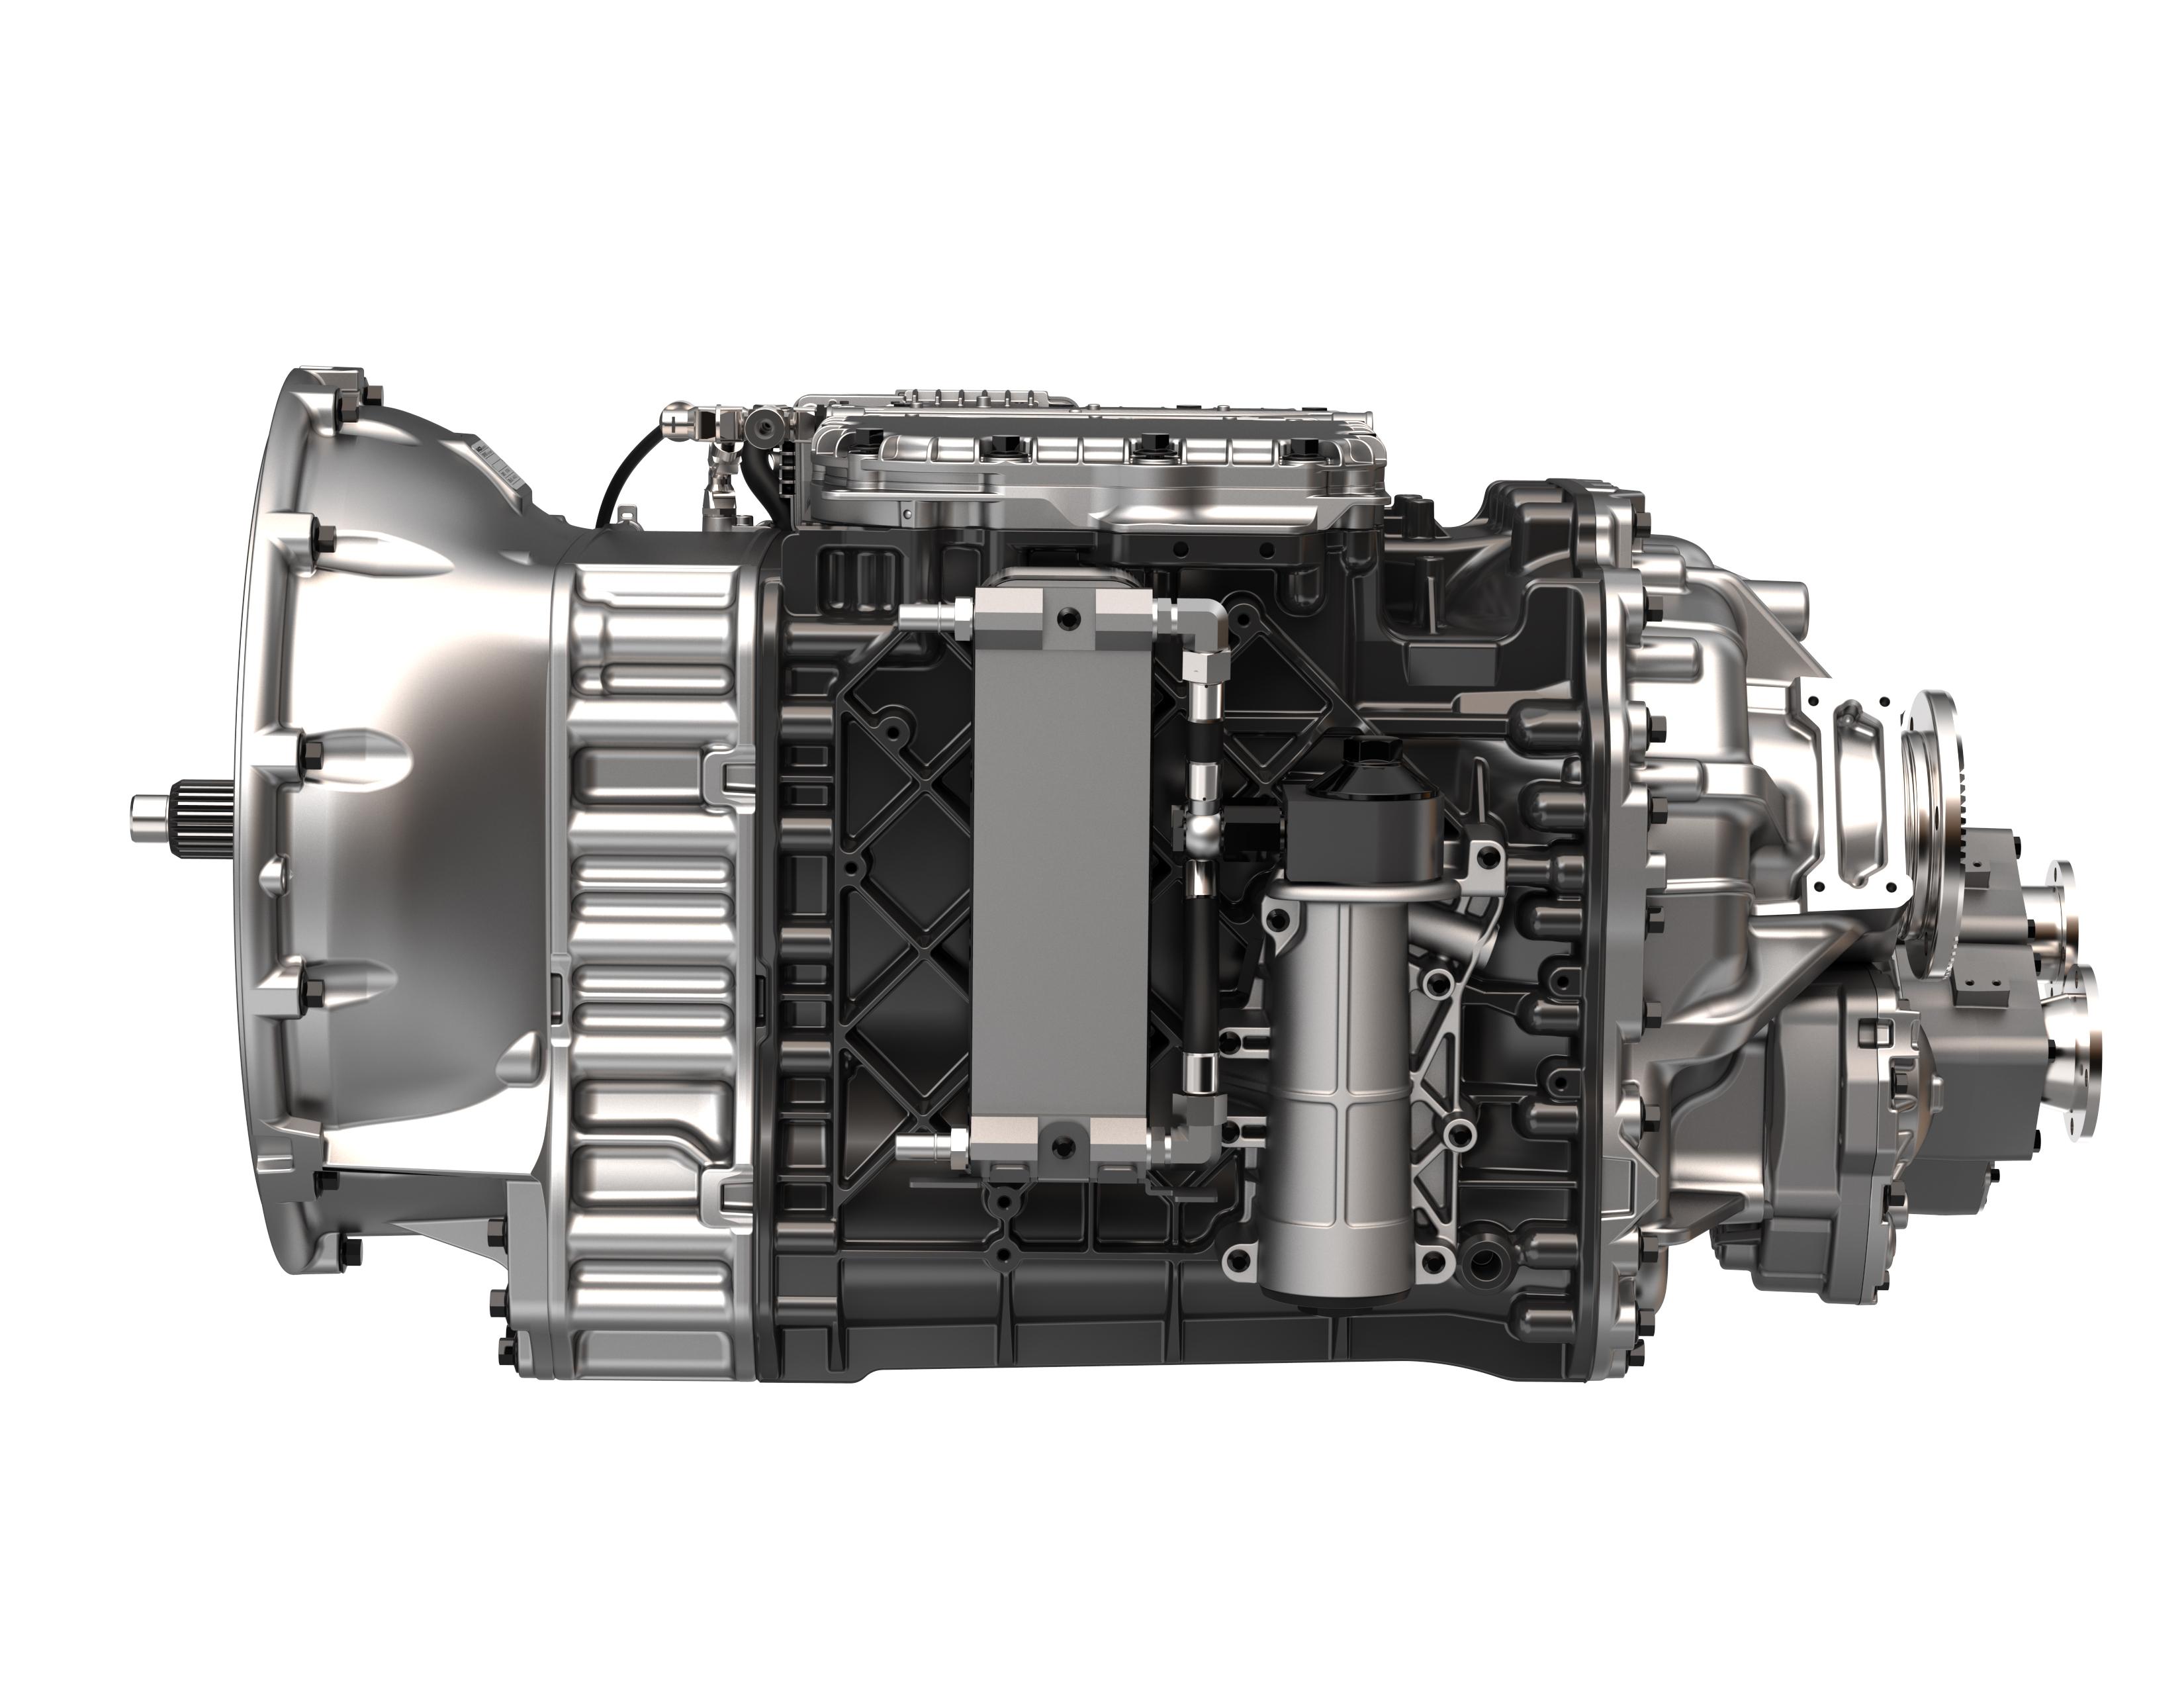 Mack makes 13-speed AMT standard on Granite models